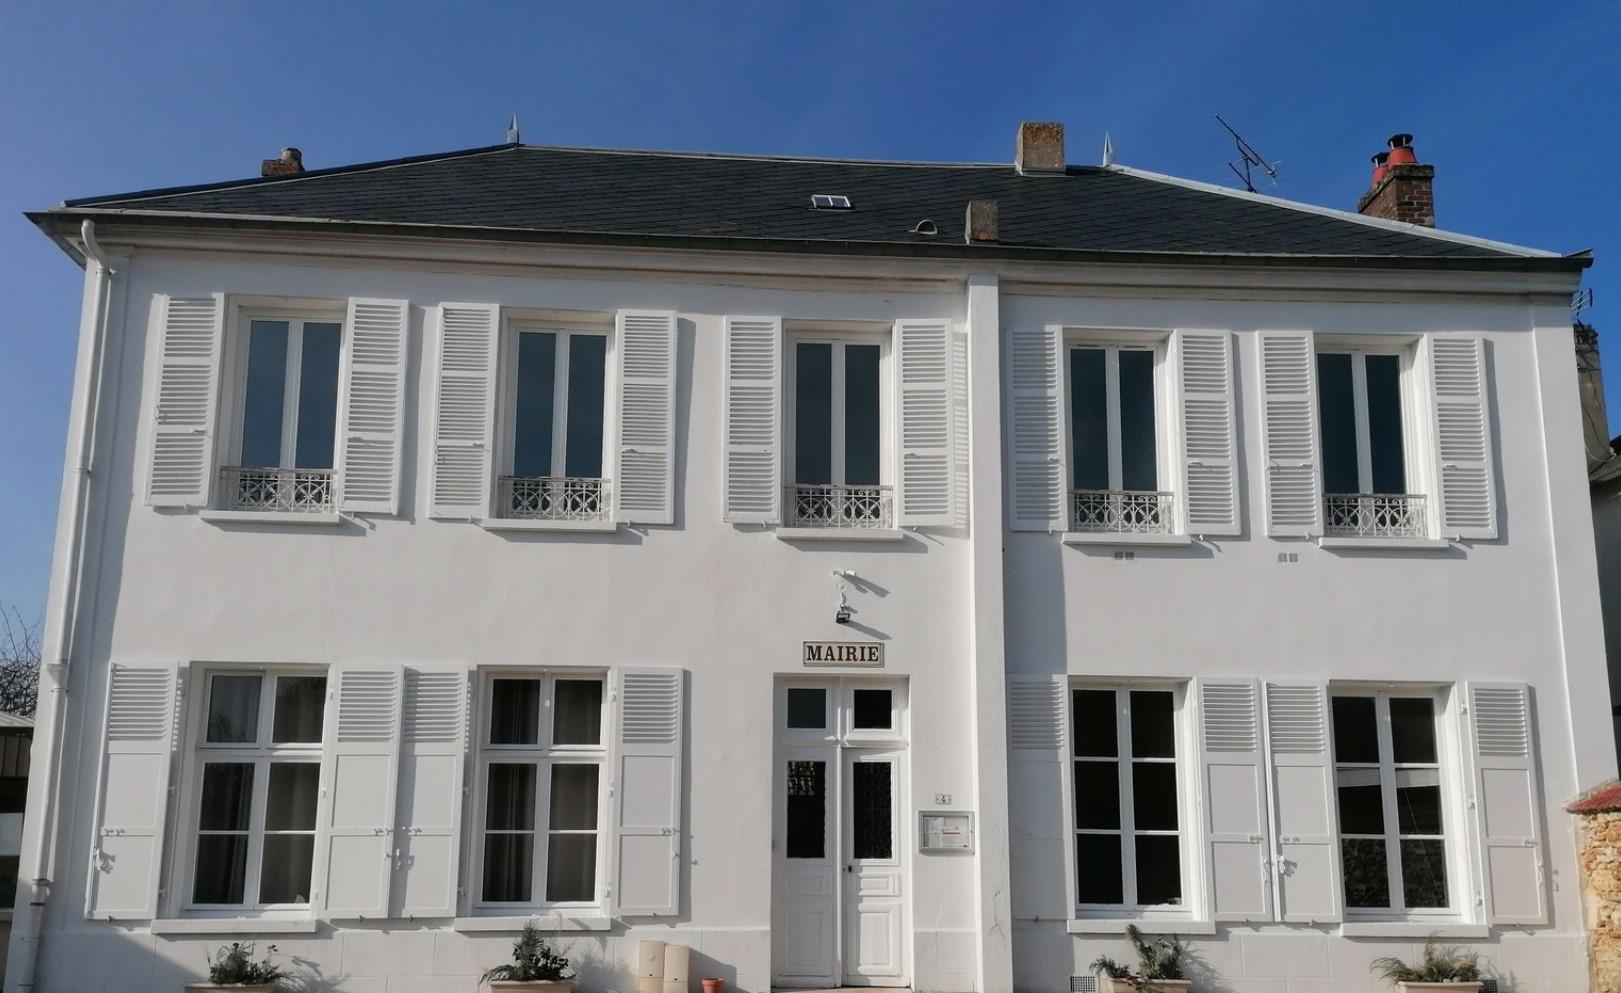 façade de la mairie de Breancon